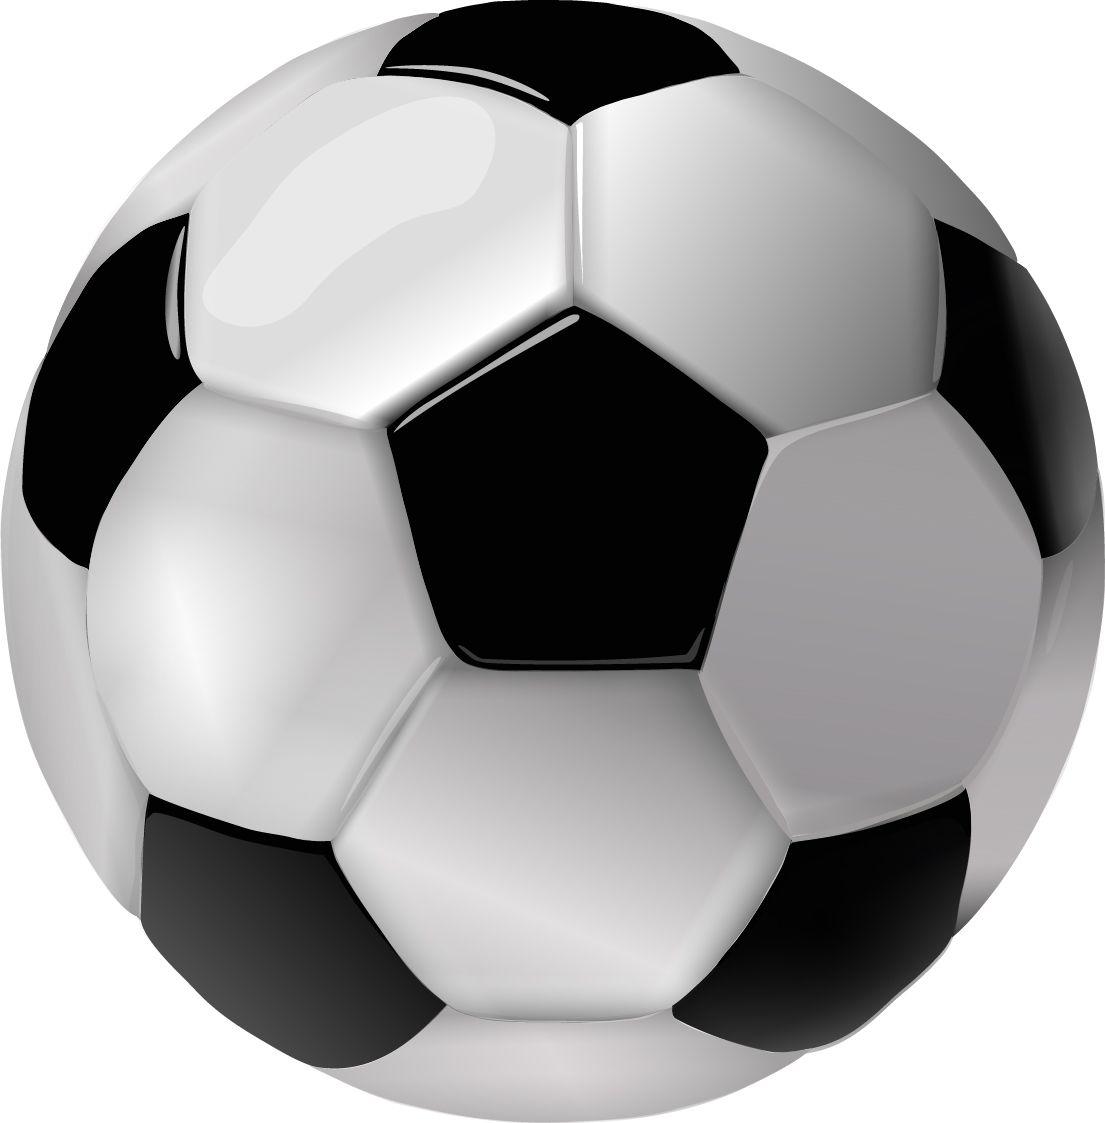 Soccer Ball Download Vector